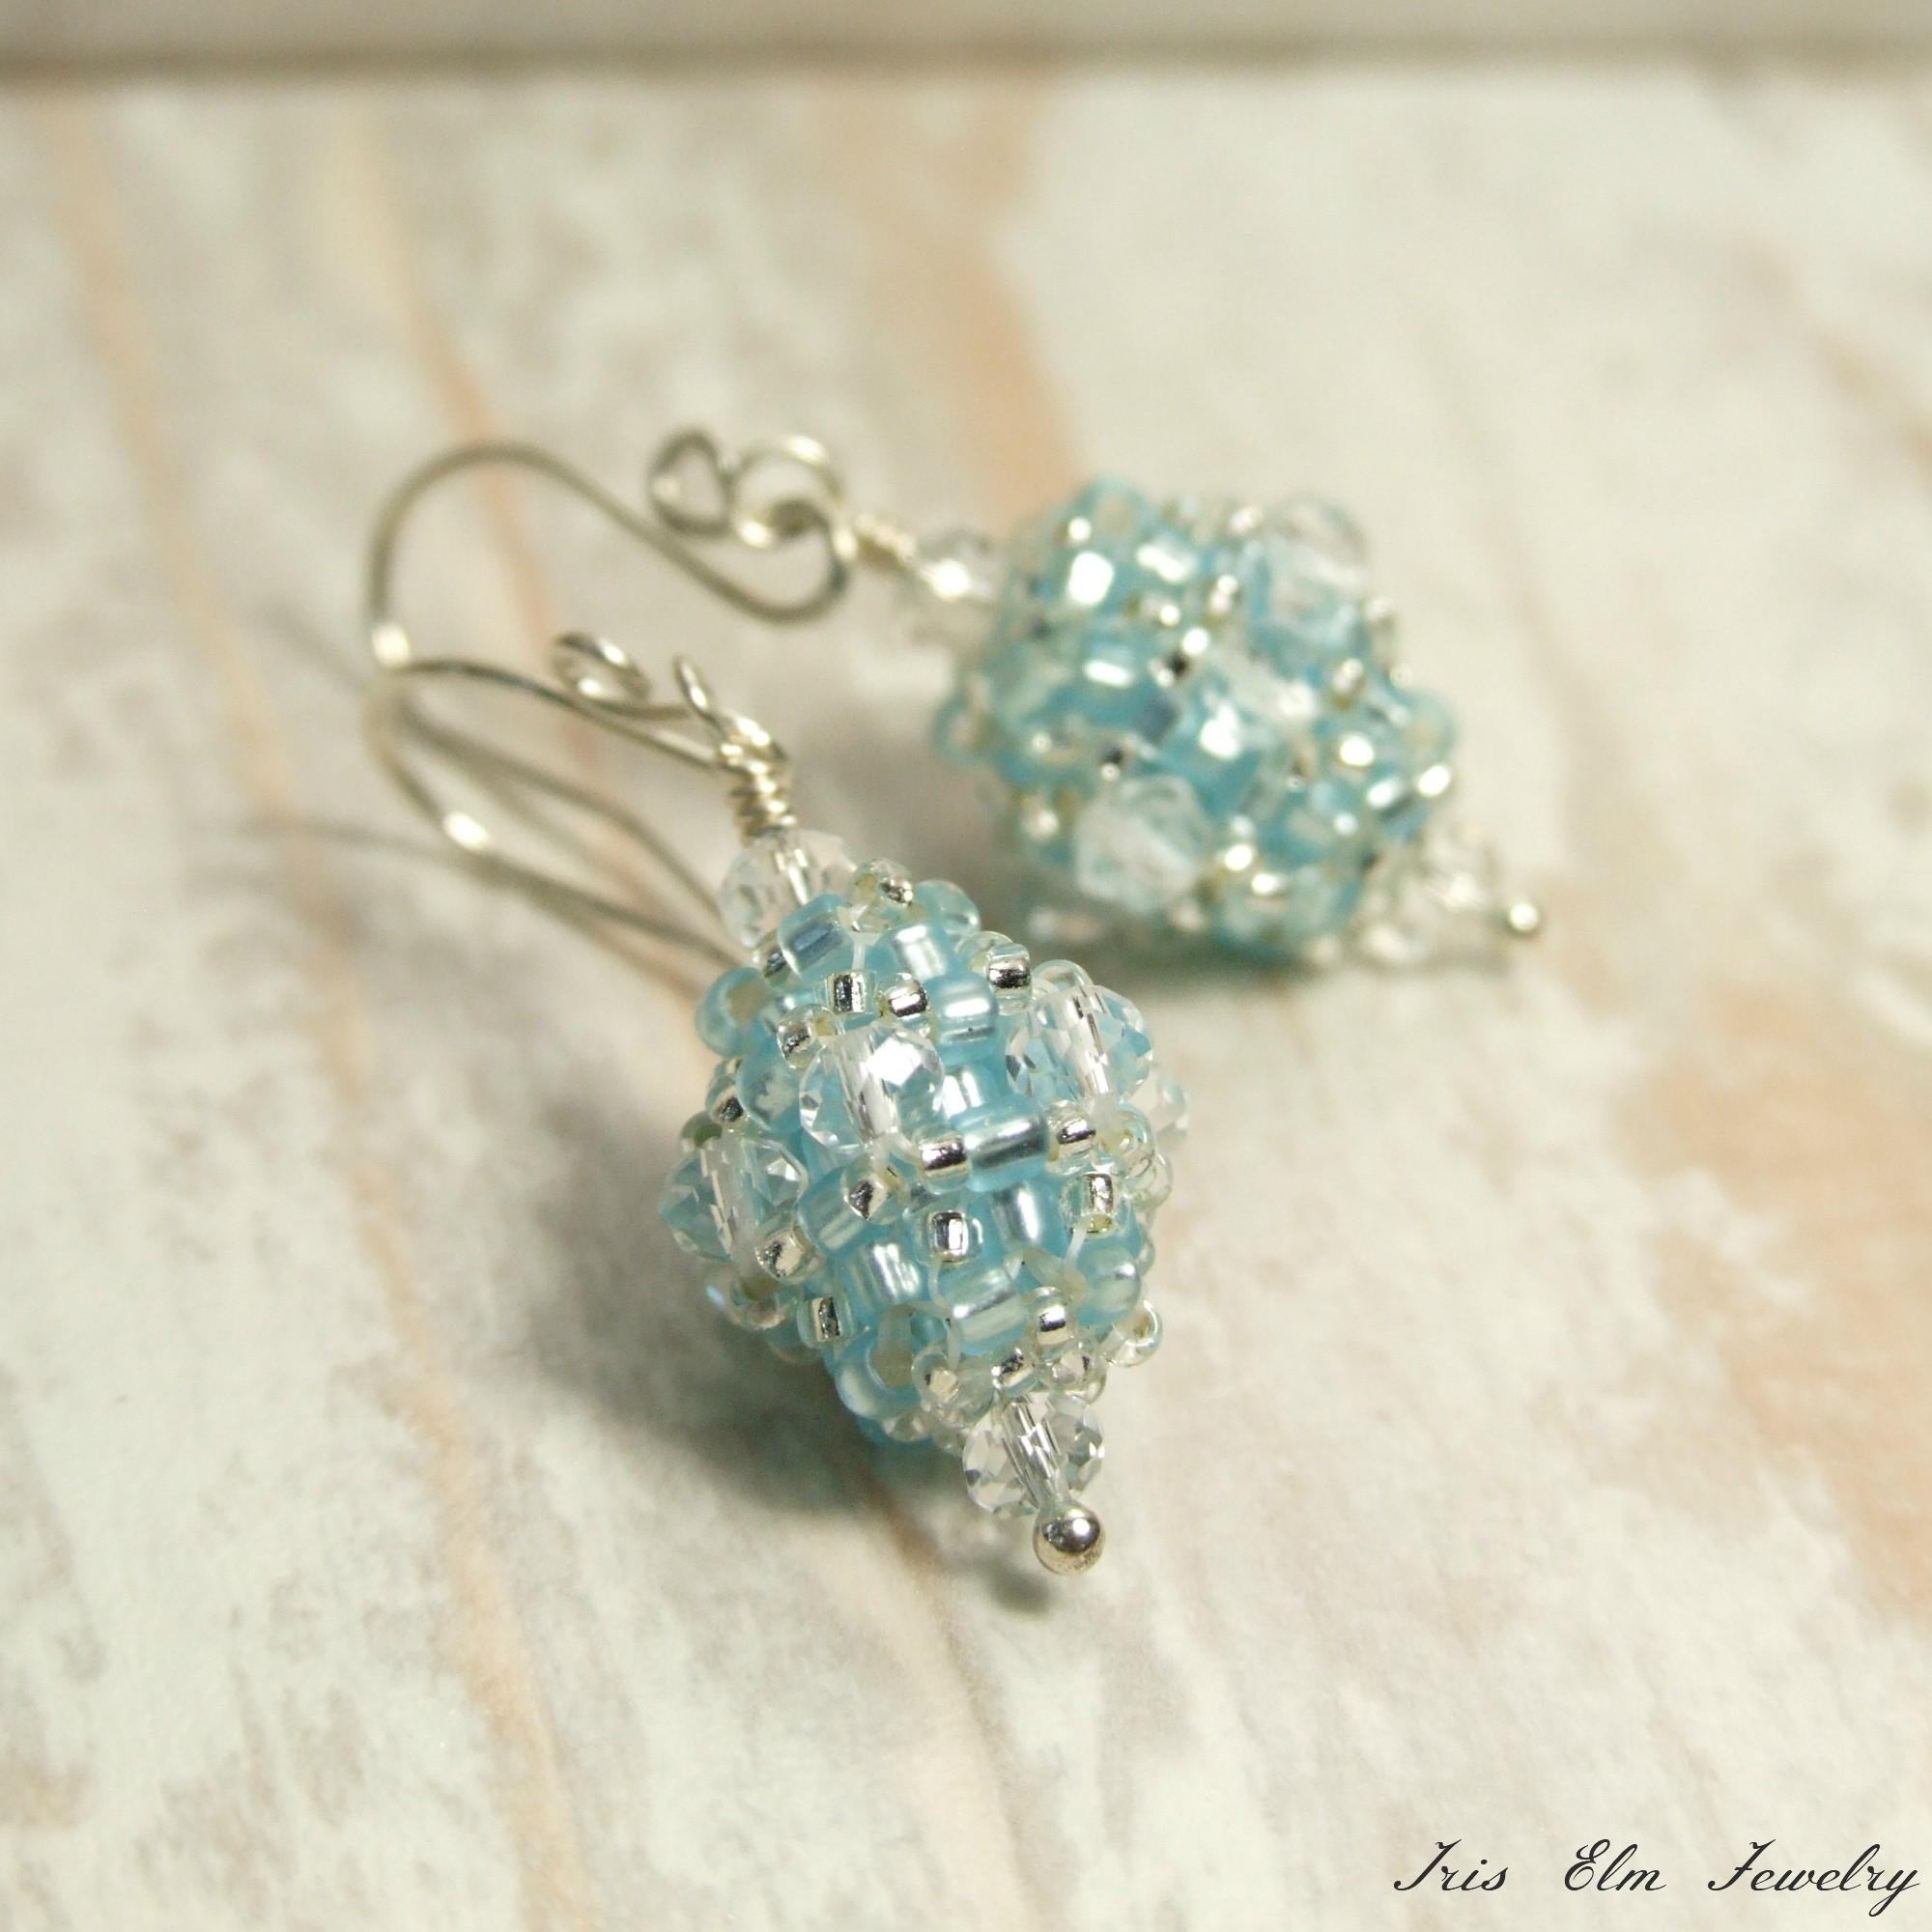 Ice Blue Beaded Bead Vintage Style Glass Earrings